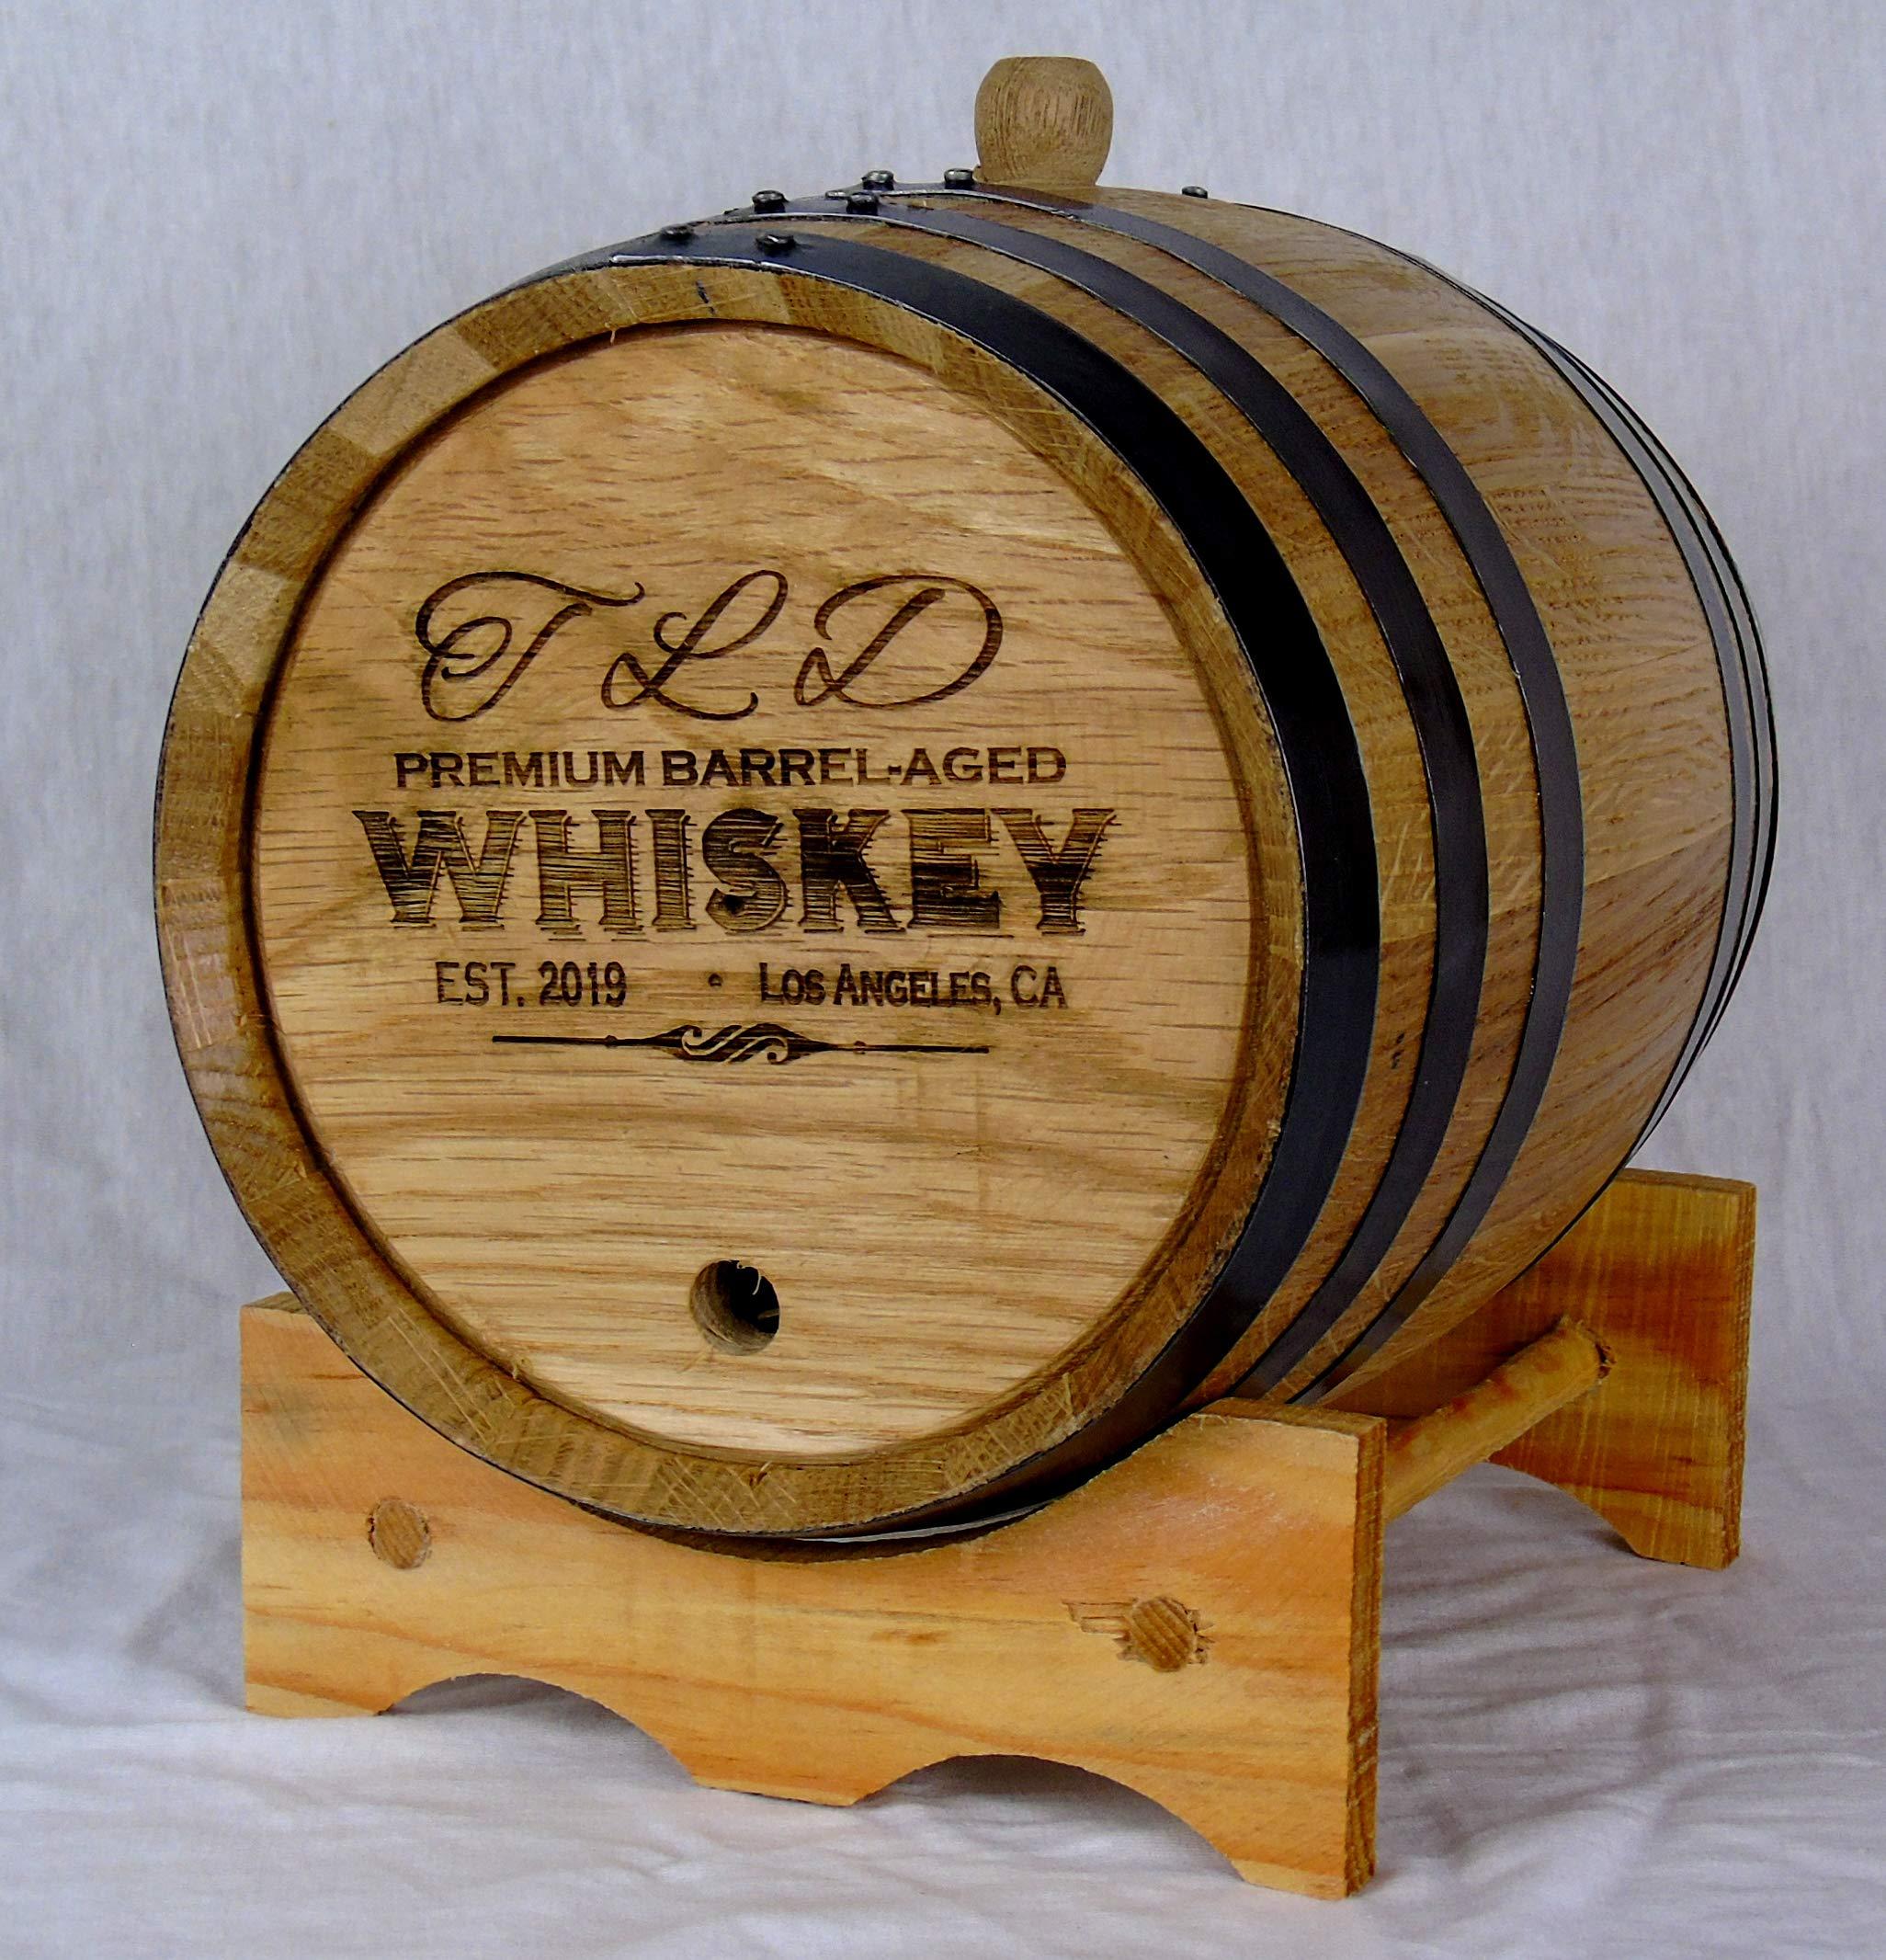 Personalized Engraved White American Oak Aging Barrels RHB155 (3 Liter)